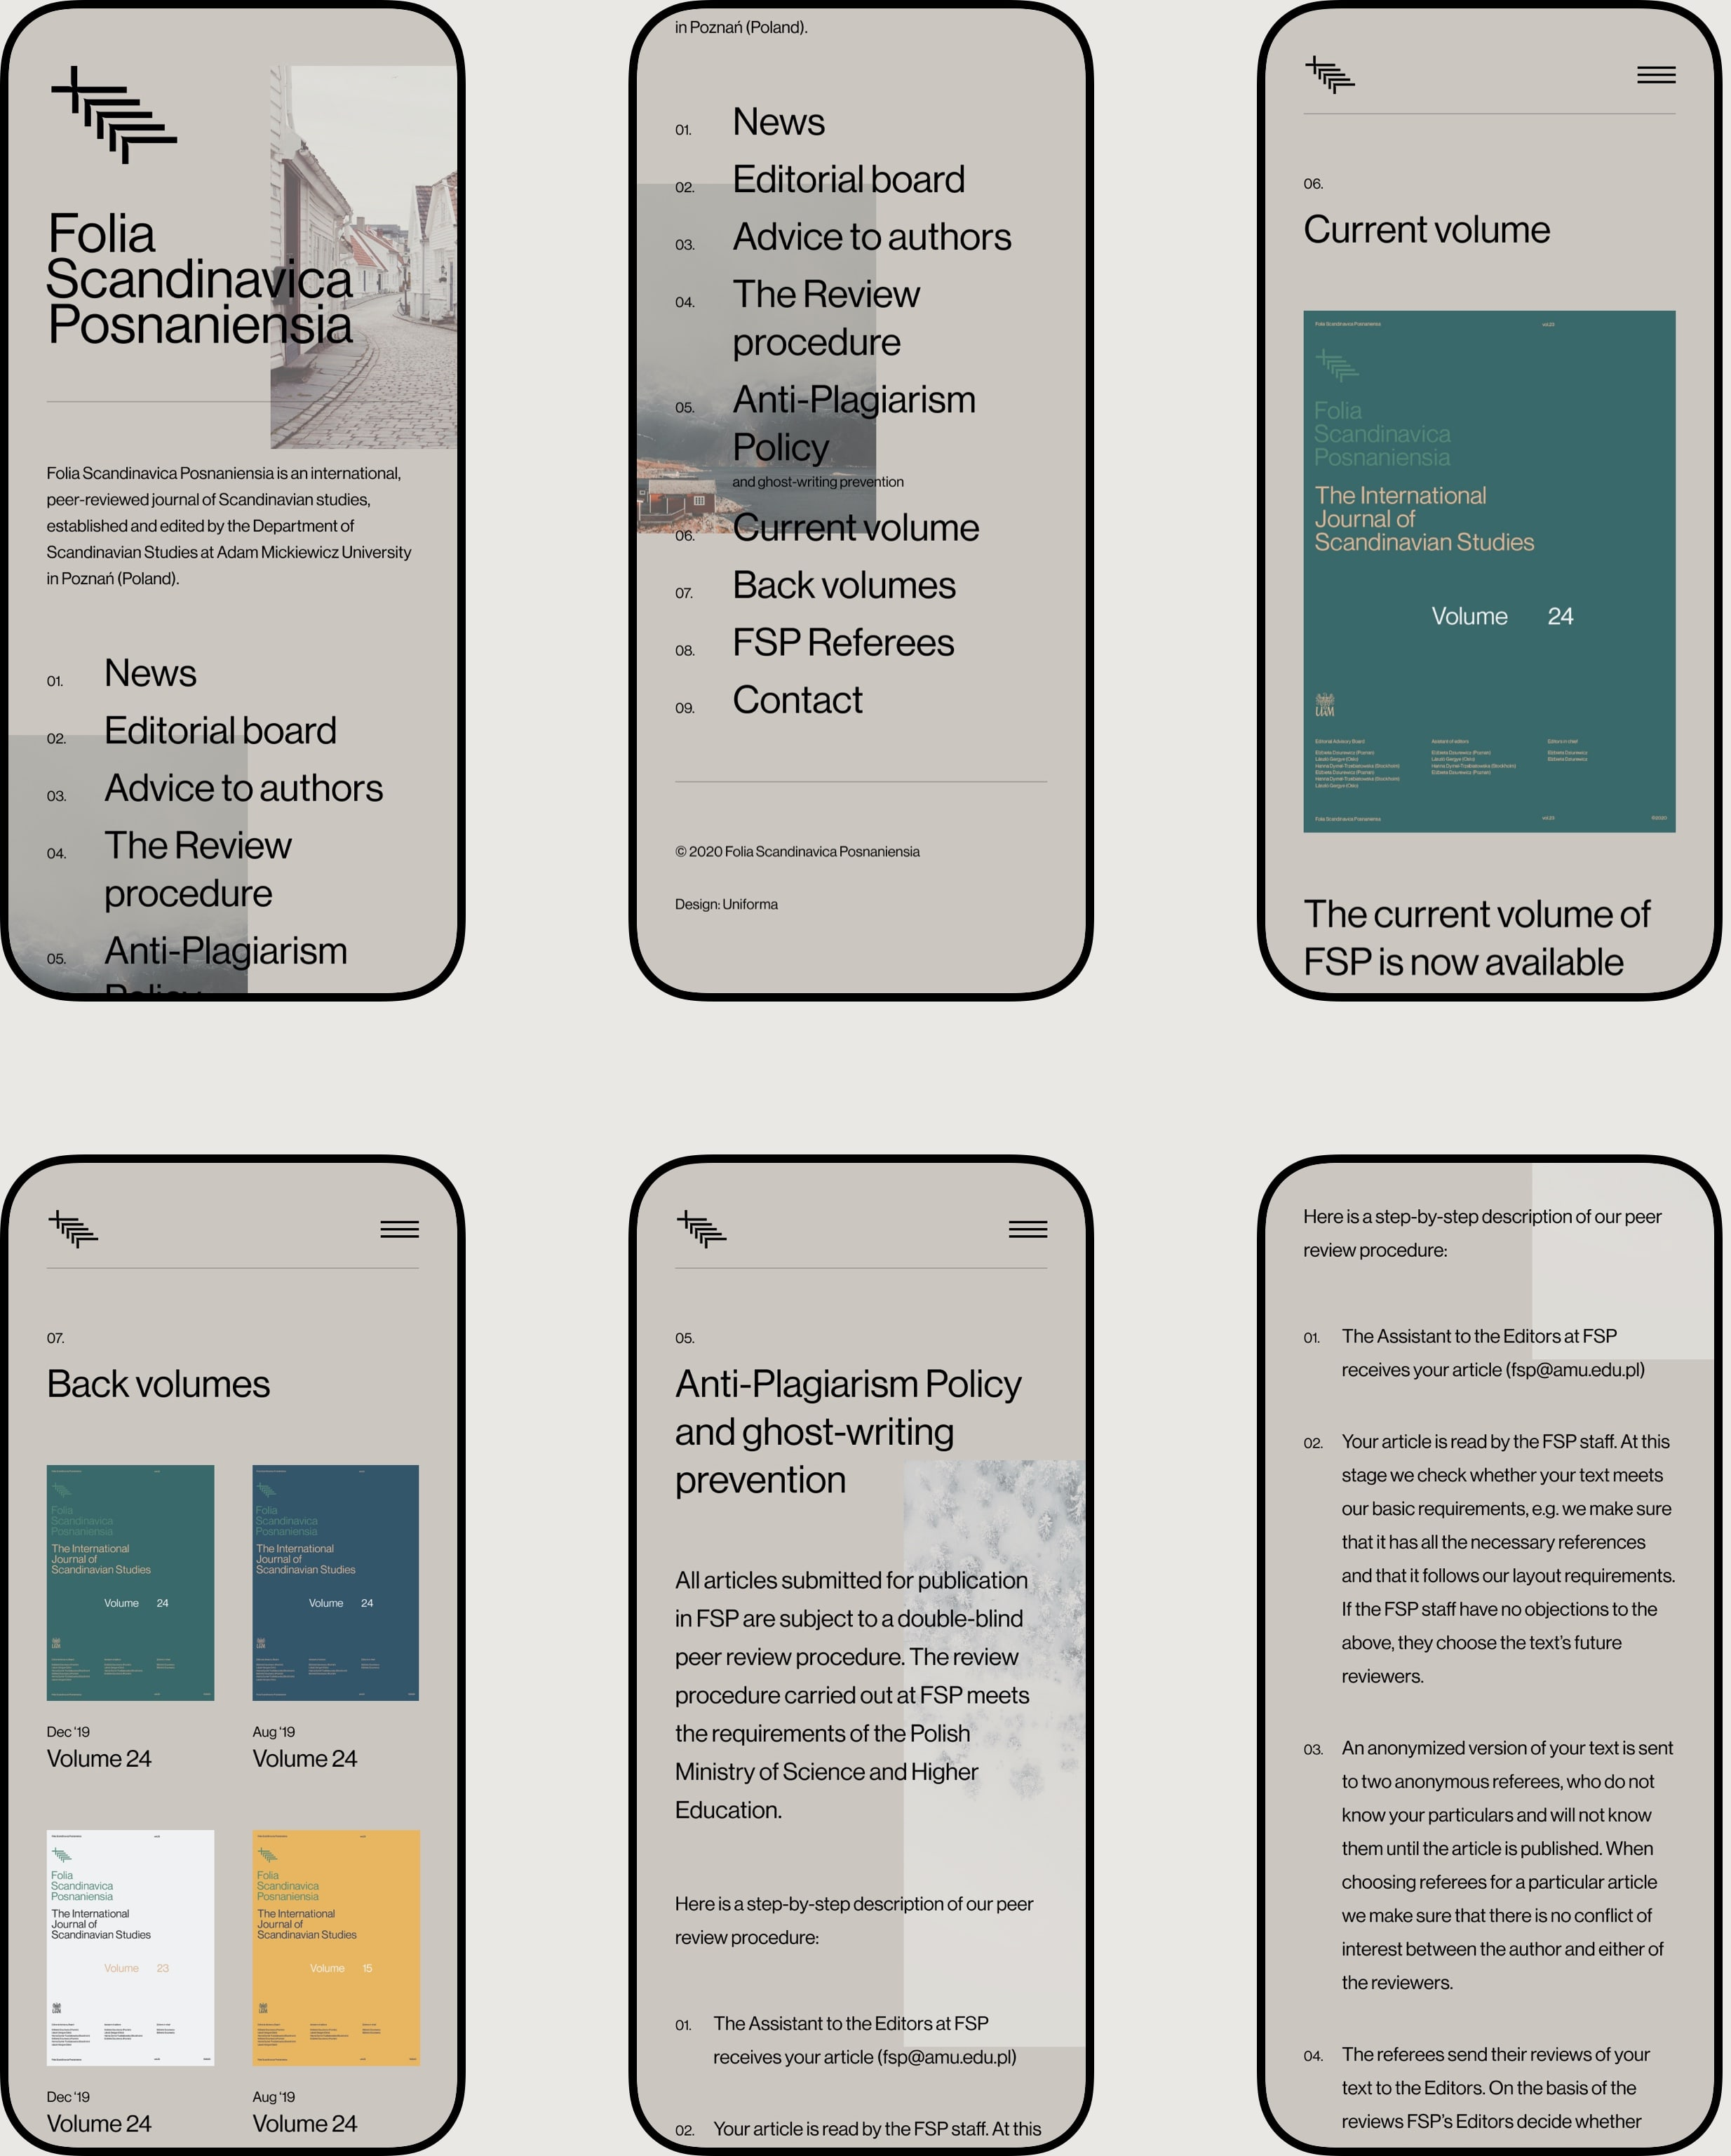 Folia Scandinavica Posnaniensia by Maciej Mach - UI/UX designer / Poland / Poznań